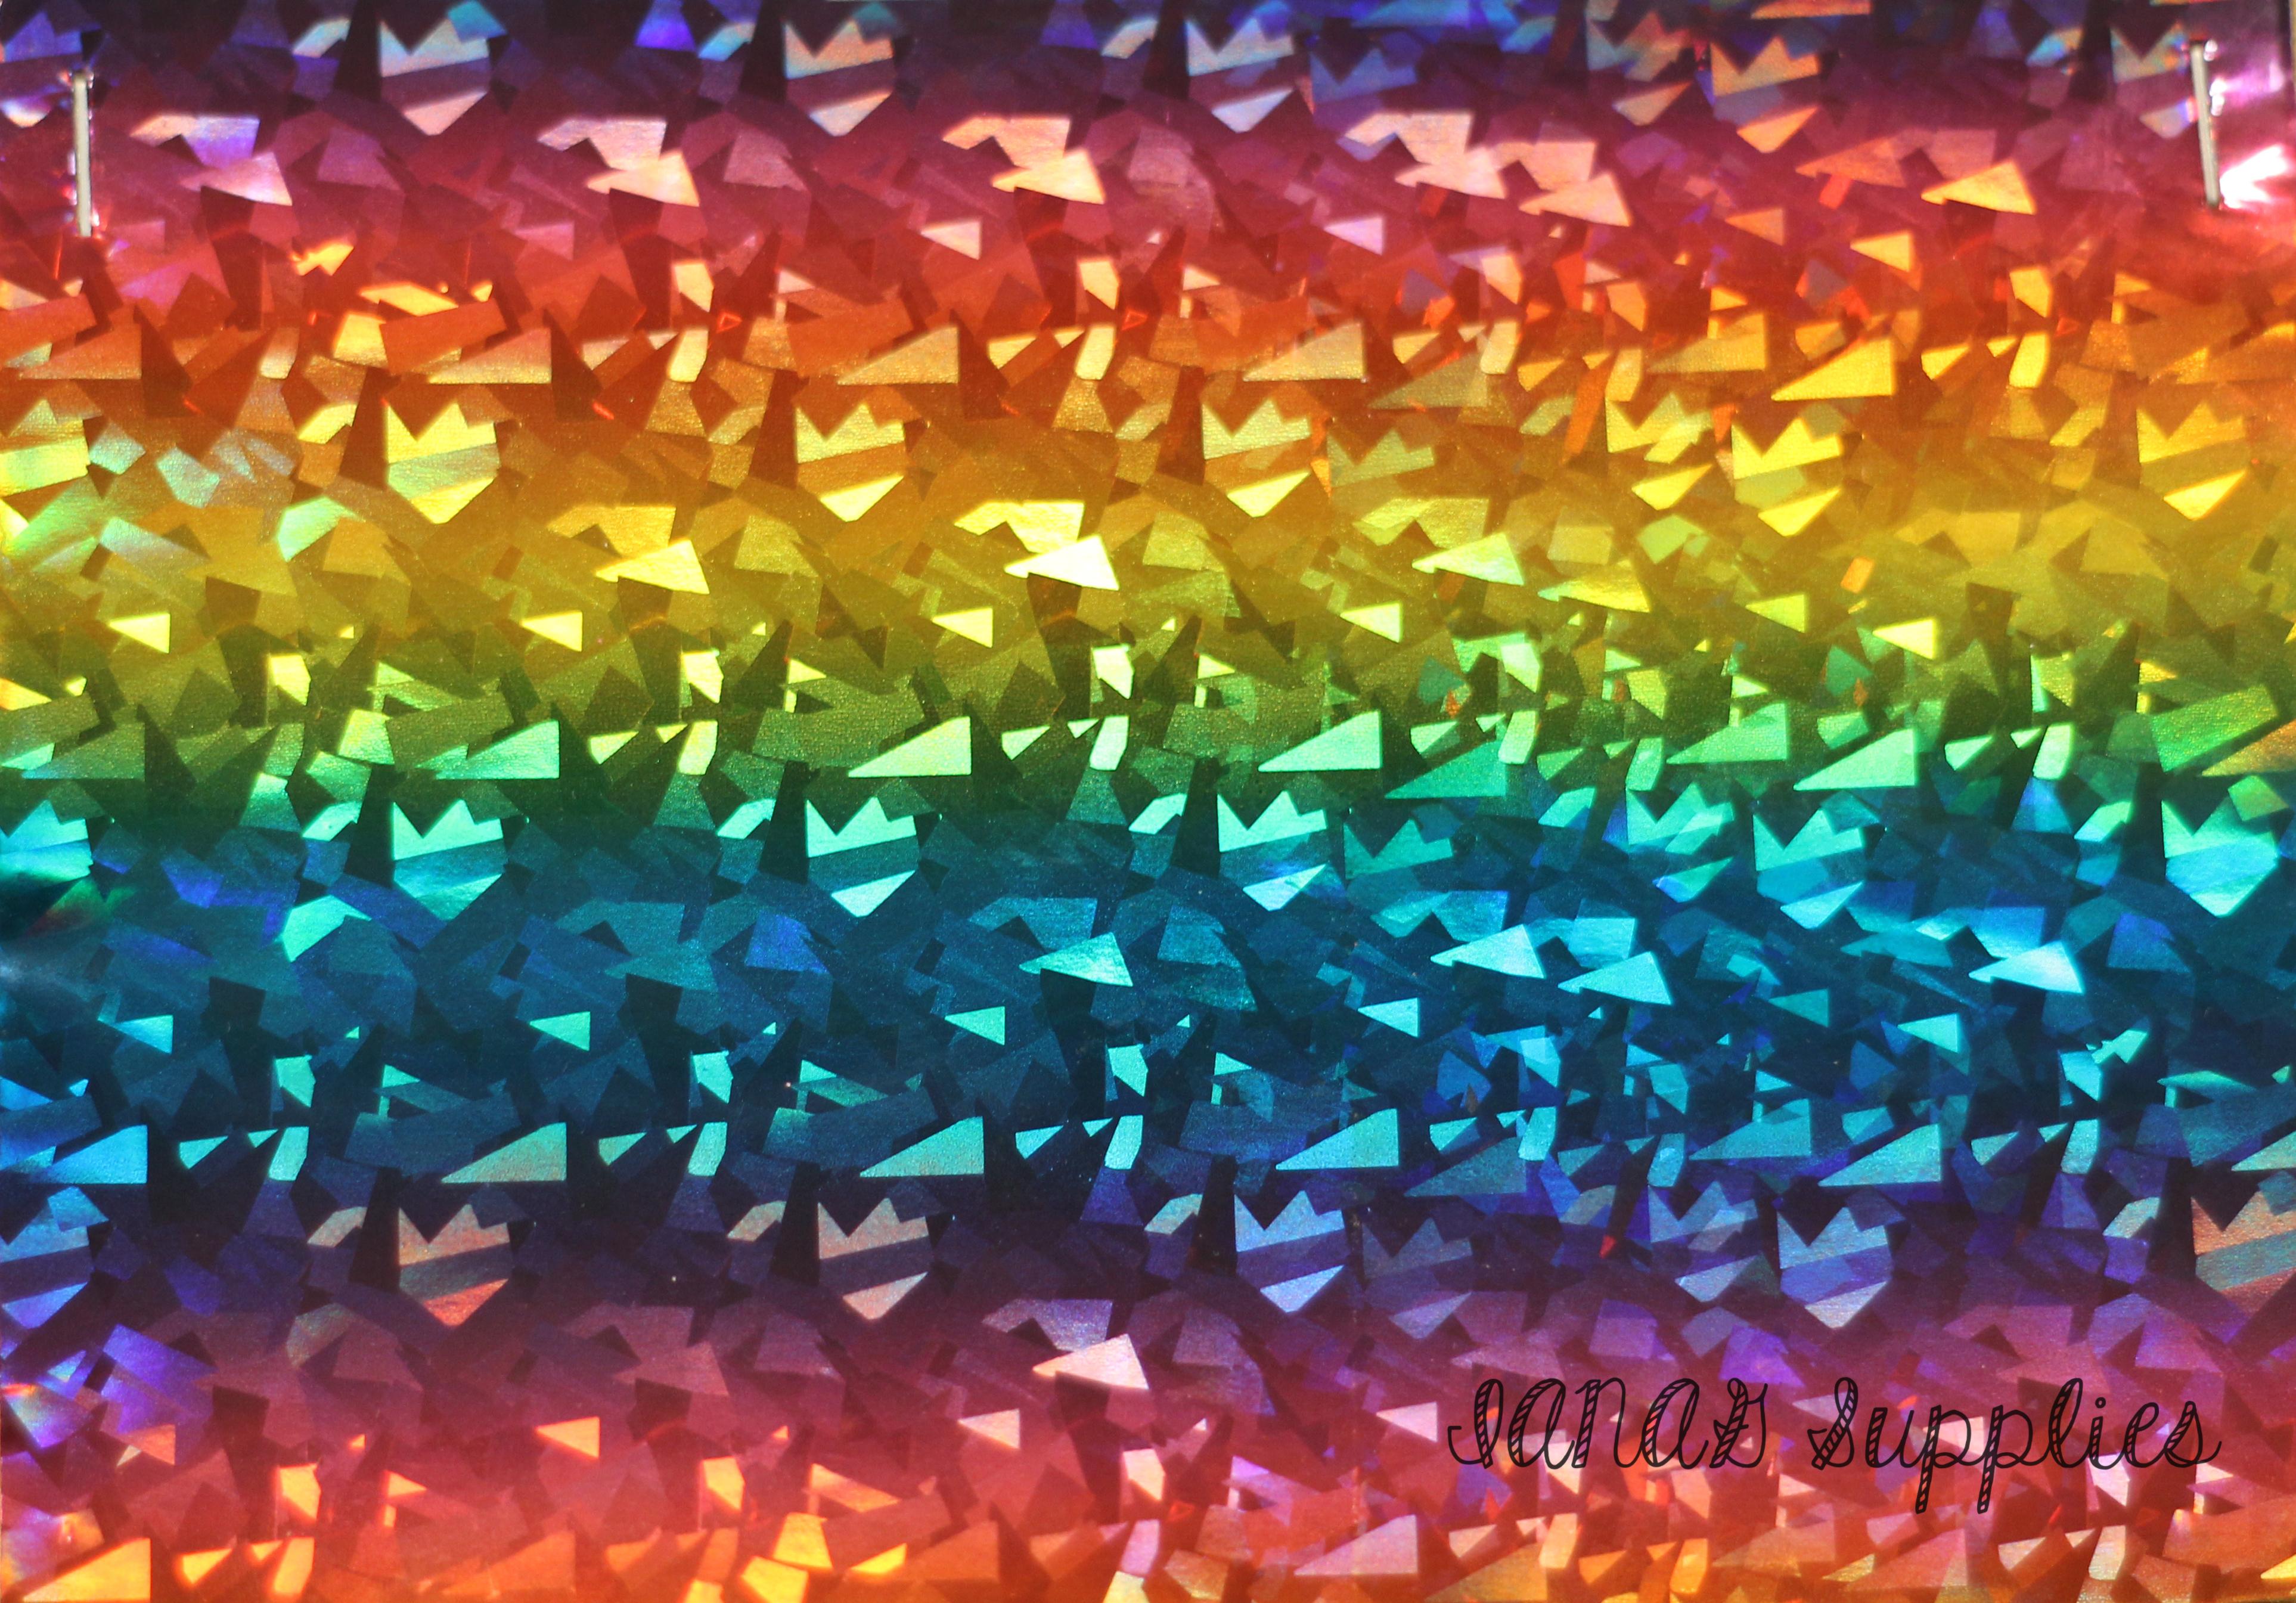 Holographic Rainbow Embroidery Vinyl Sewing Vinyl Craft Vinyl